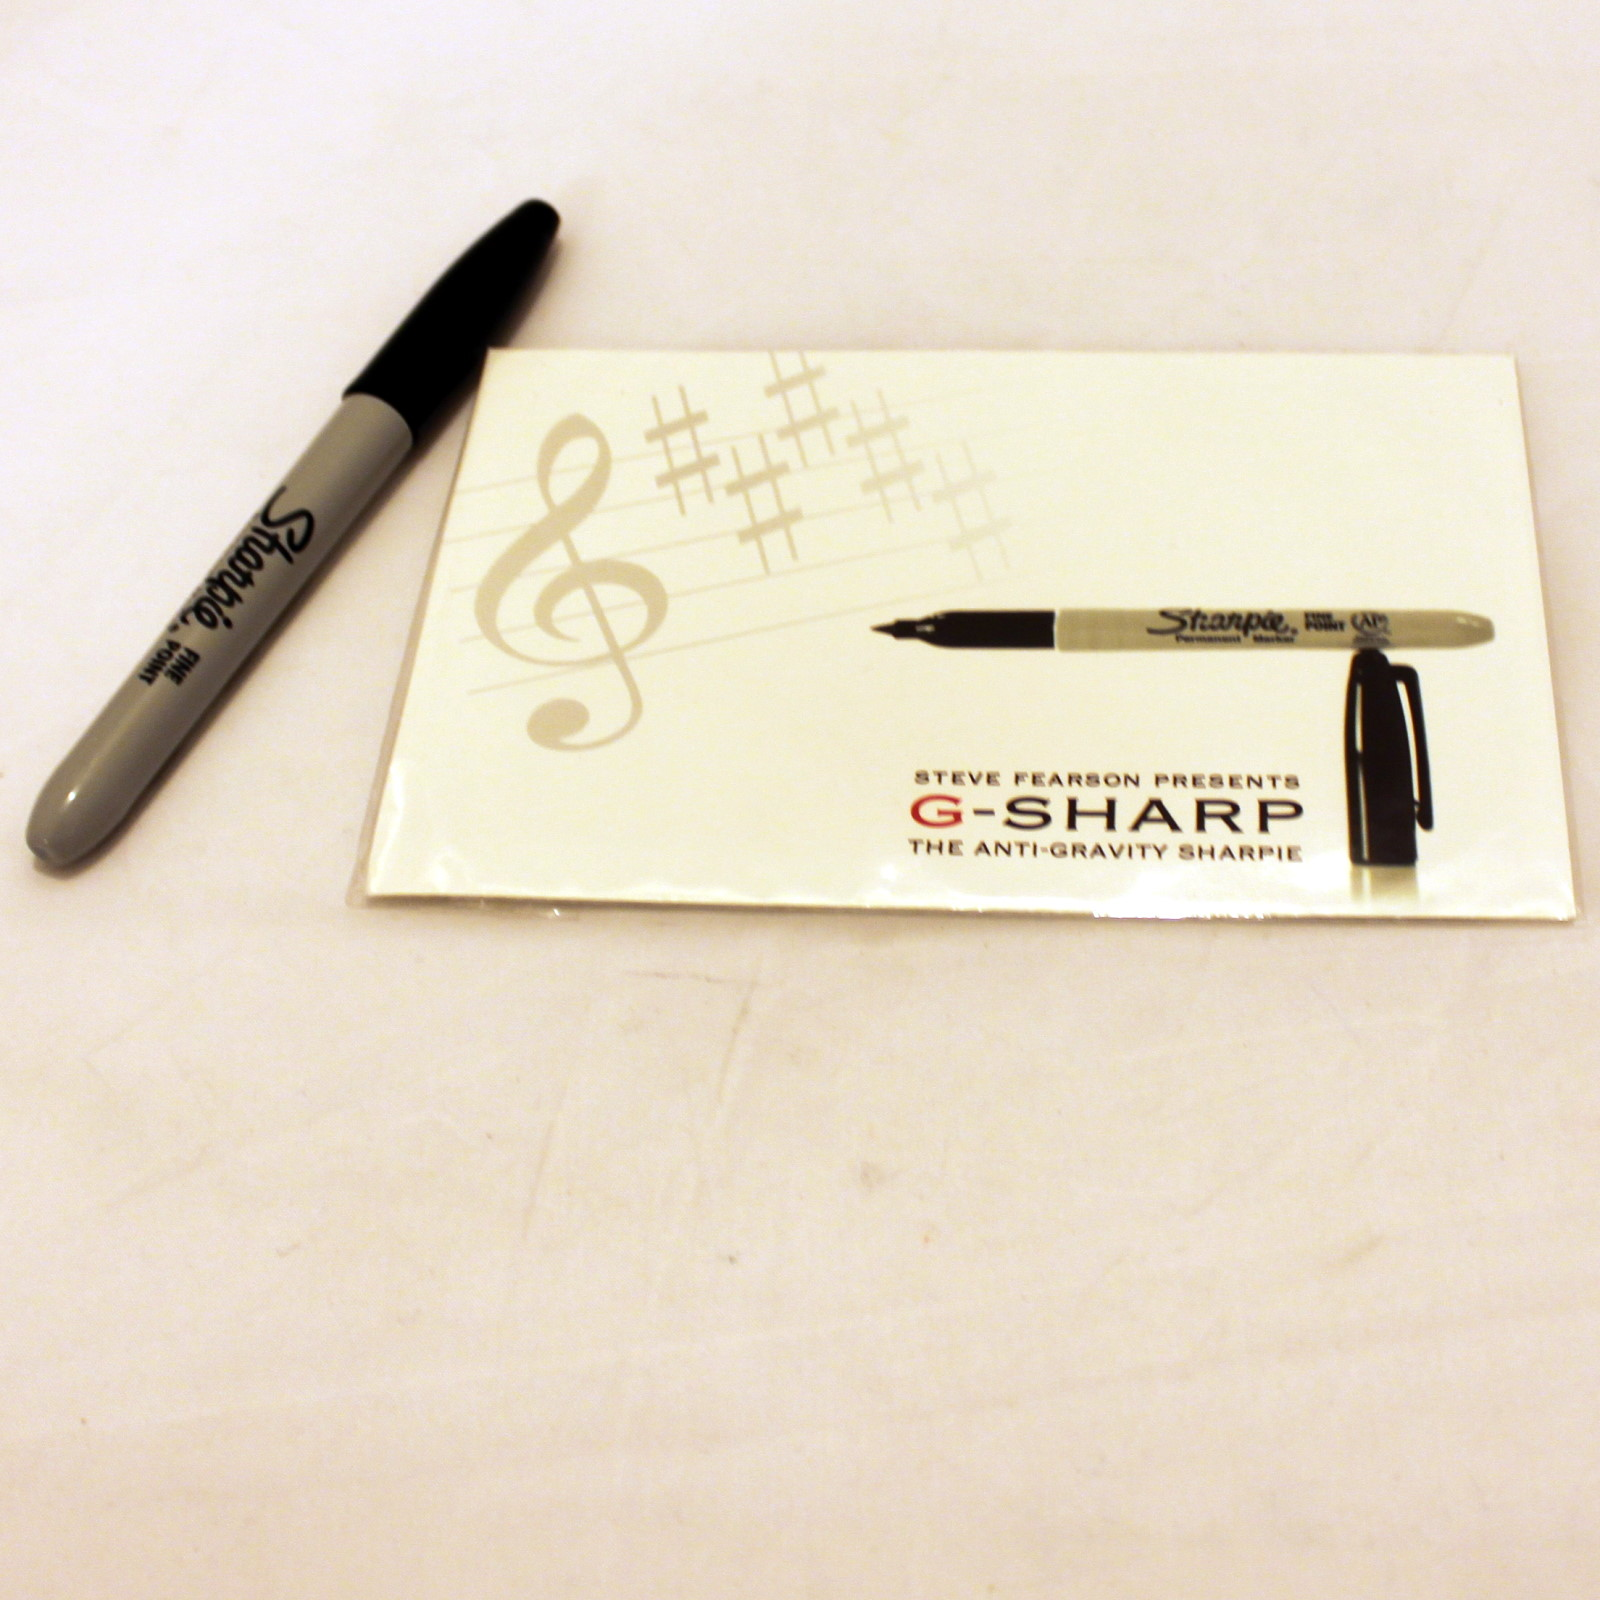 G-Sharp by Steve Fearson